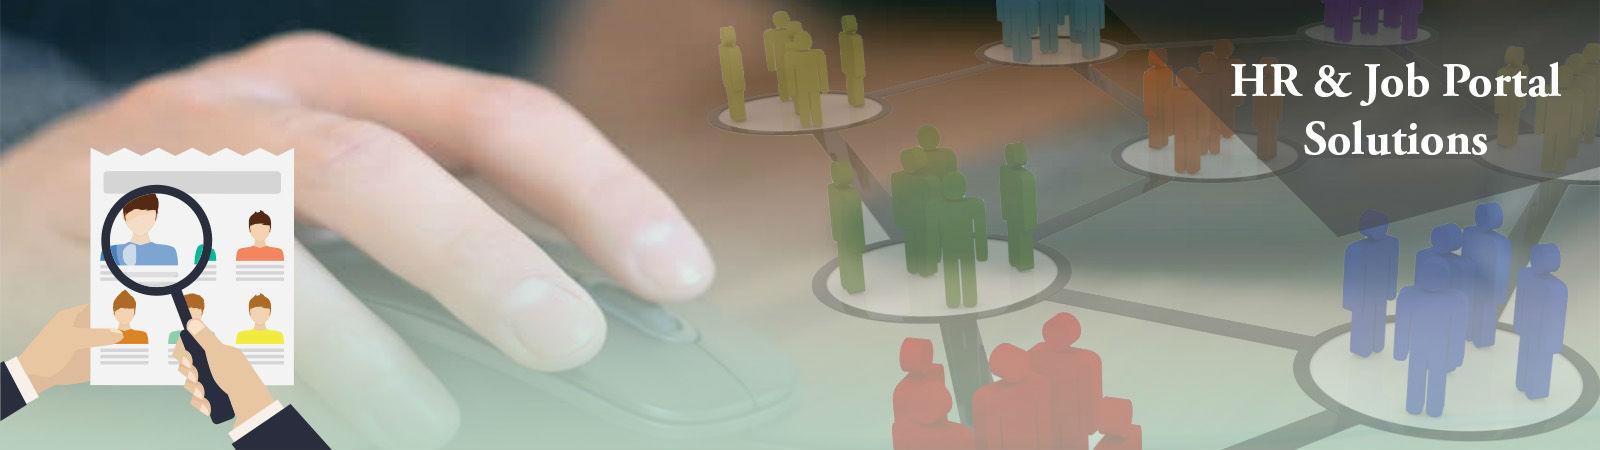 HR and Job Portal Solutions